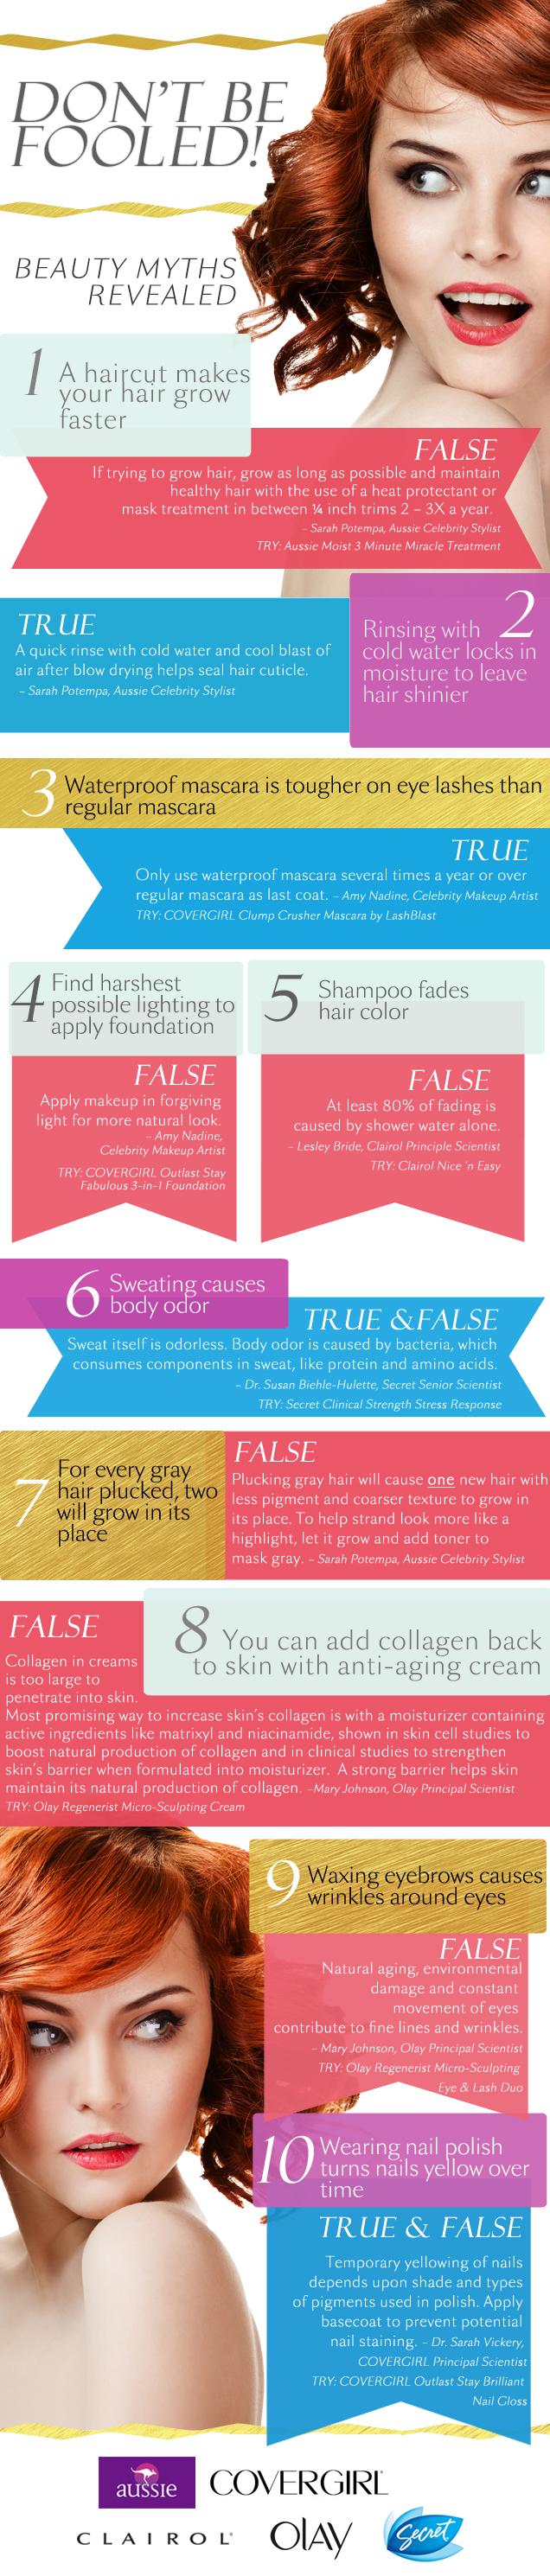 April Fools Day Beauty Myths_HR (1)